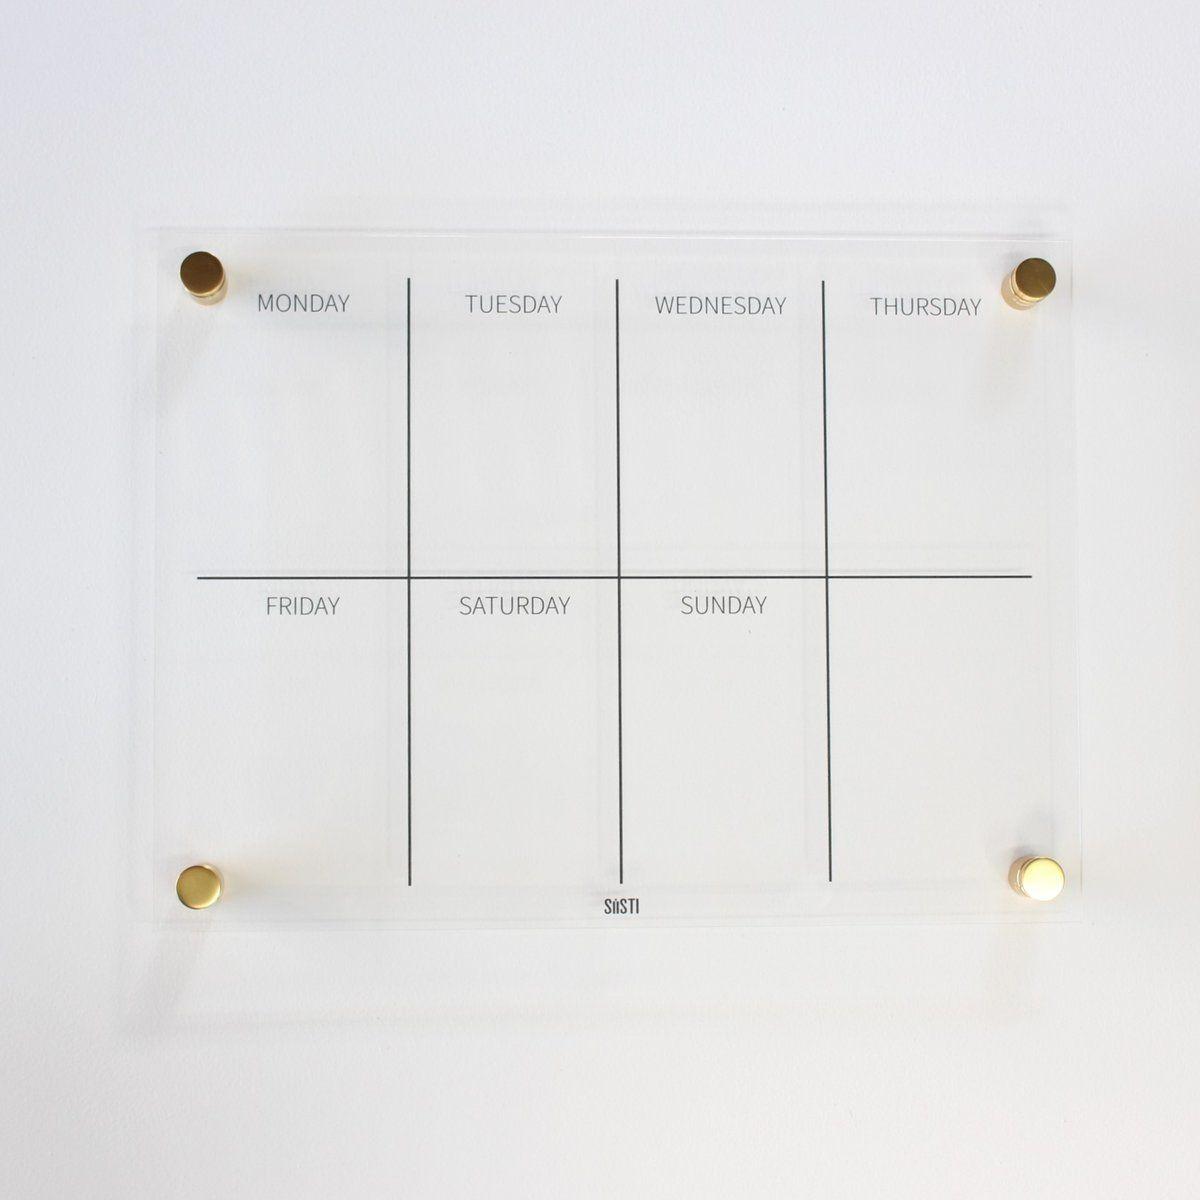 Black Acrylic Plexiglass 1 4 You Pick The Size Plastic Sheet Ebay Plastic Sheets Plexiglass Sheets Black Acrylics